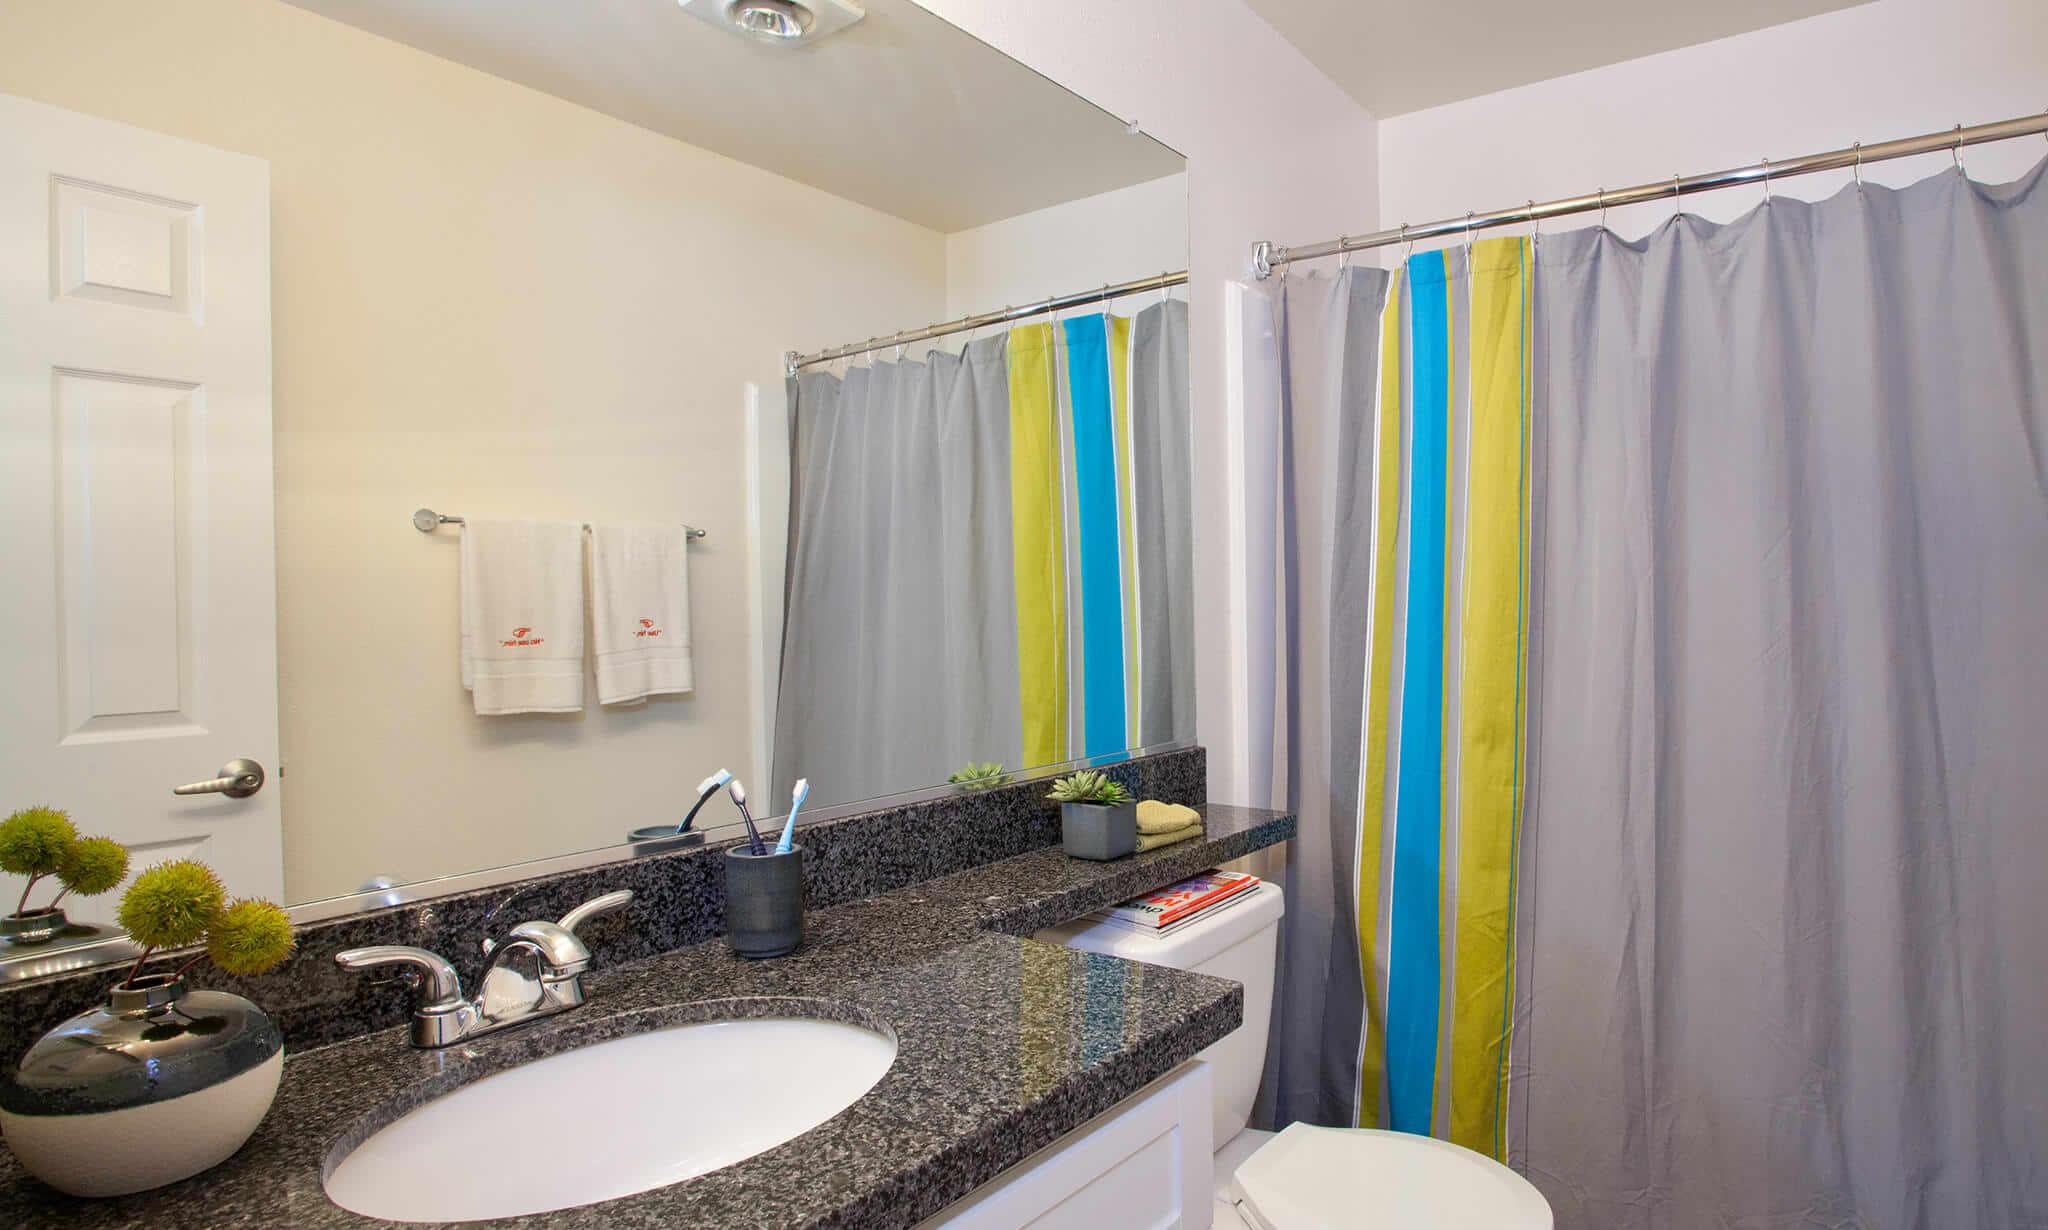 Timberleaf Apartments apartments in Santa Clara CA to rent photo 13